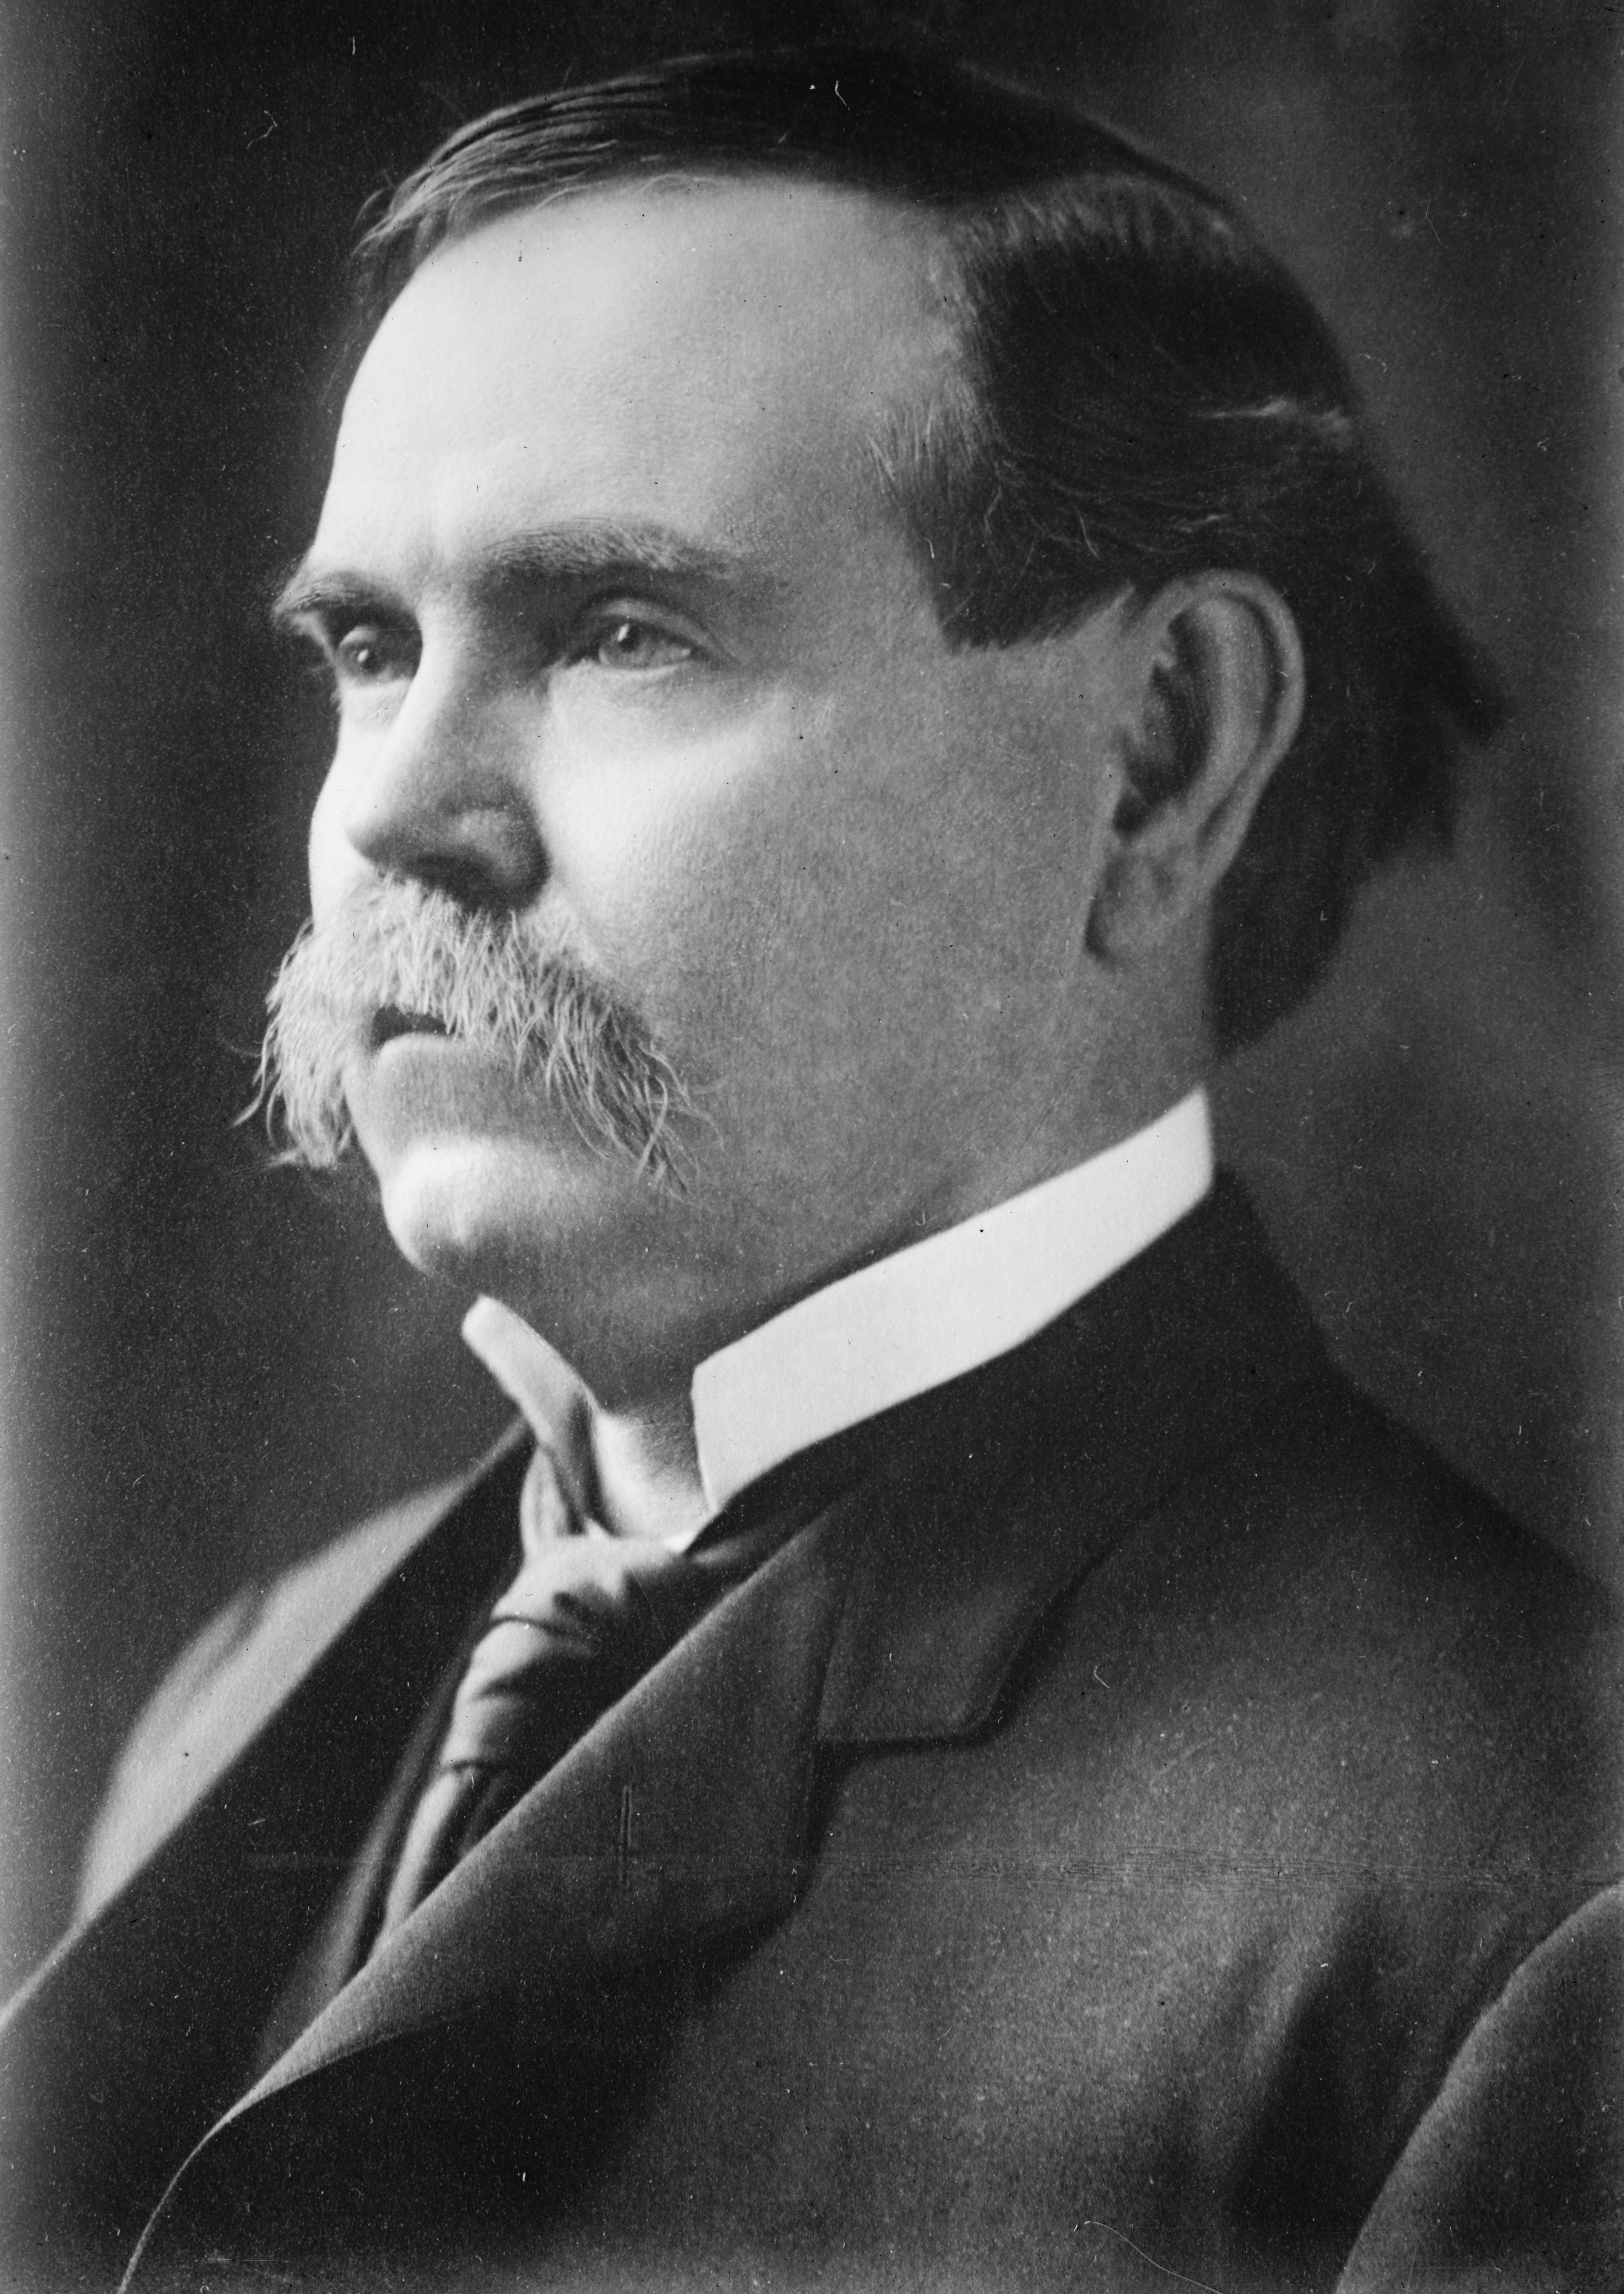 Thomas Mitchell Campbell